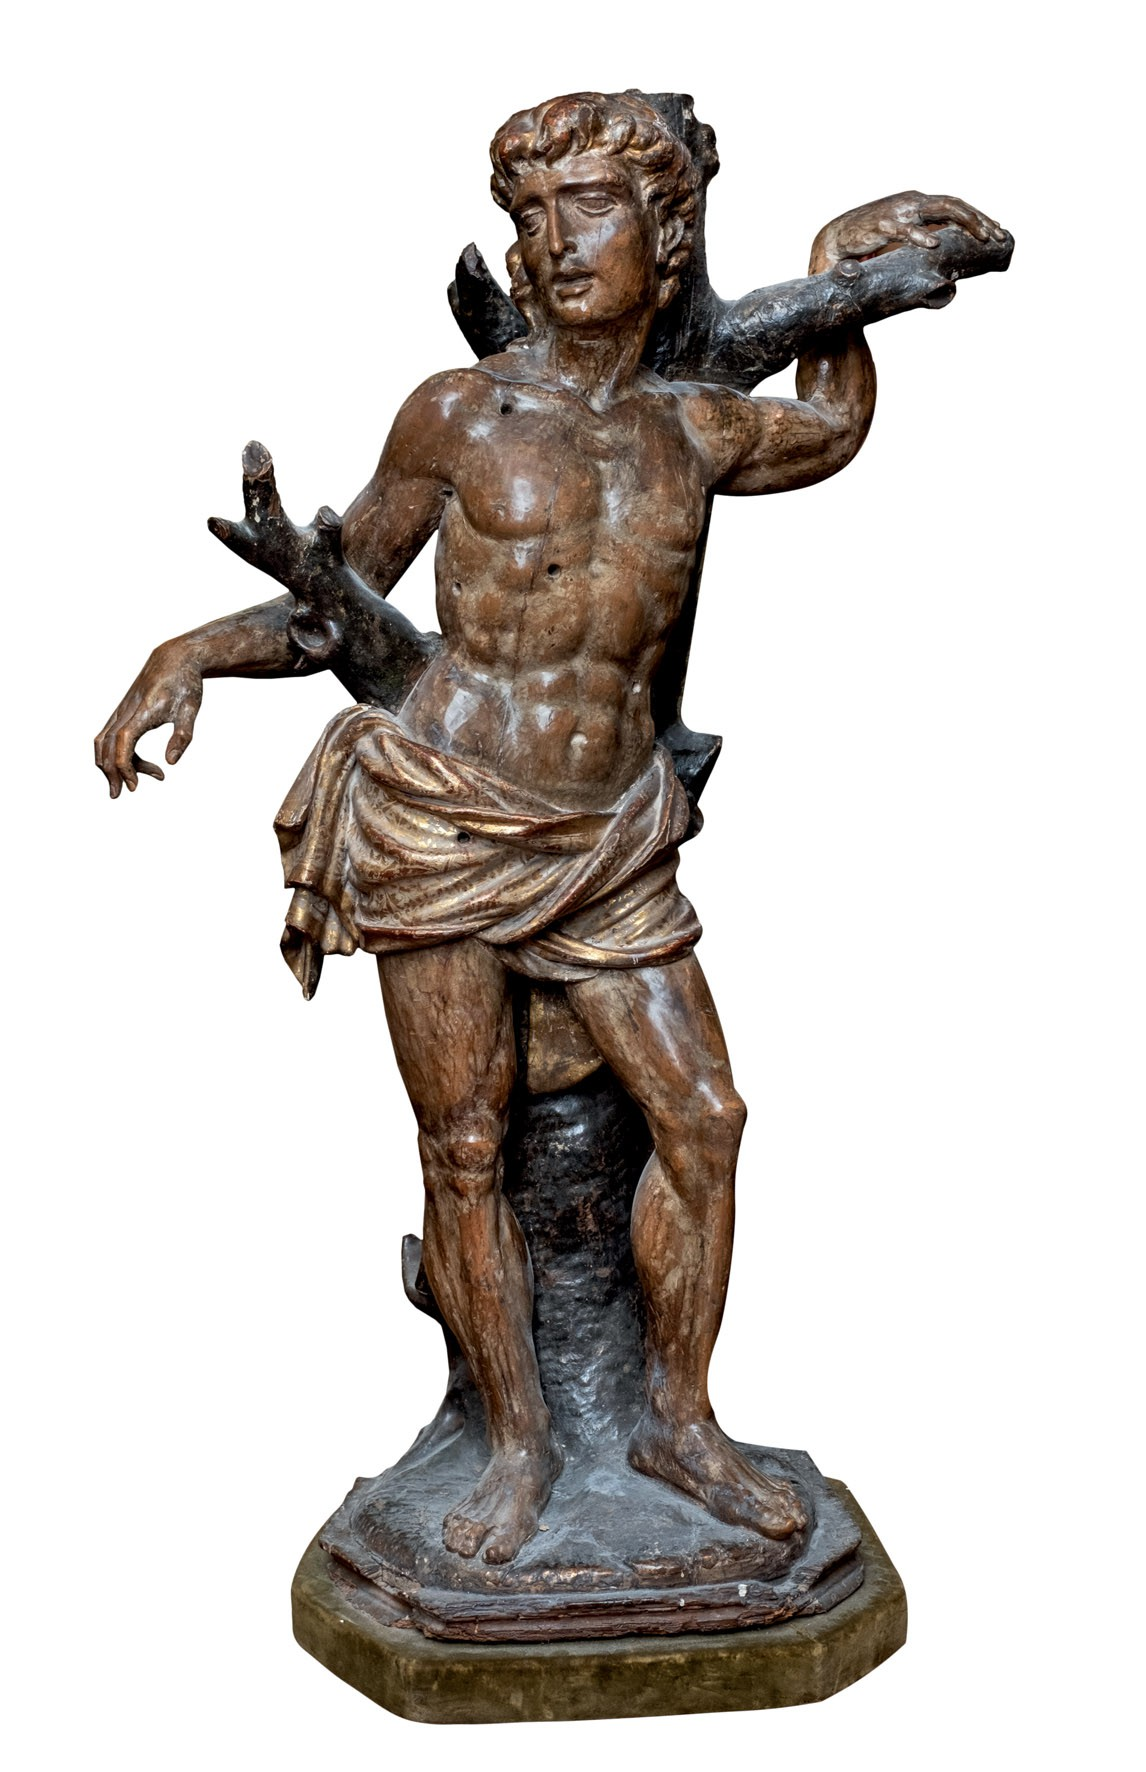 826-san-sebastin-realizado-en-madera-tallada-policromada-y-dorada.-italia-s.-xvi.00